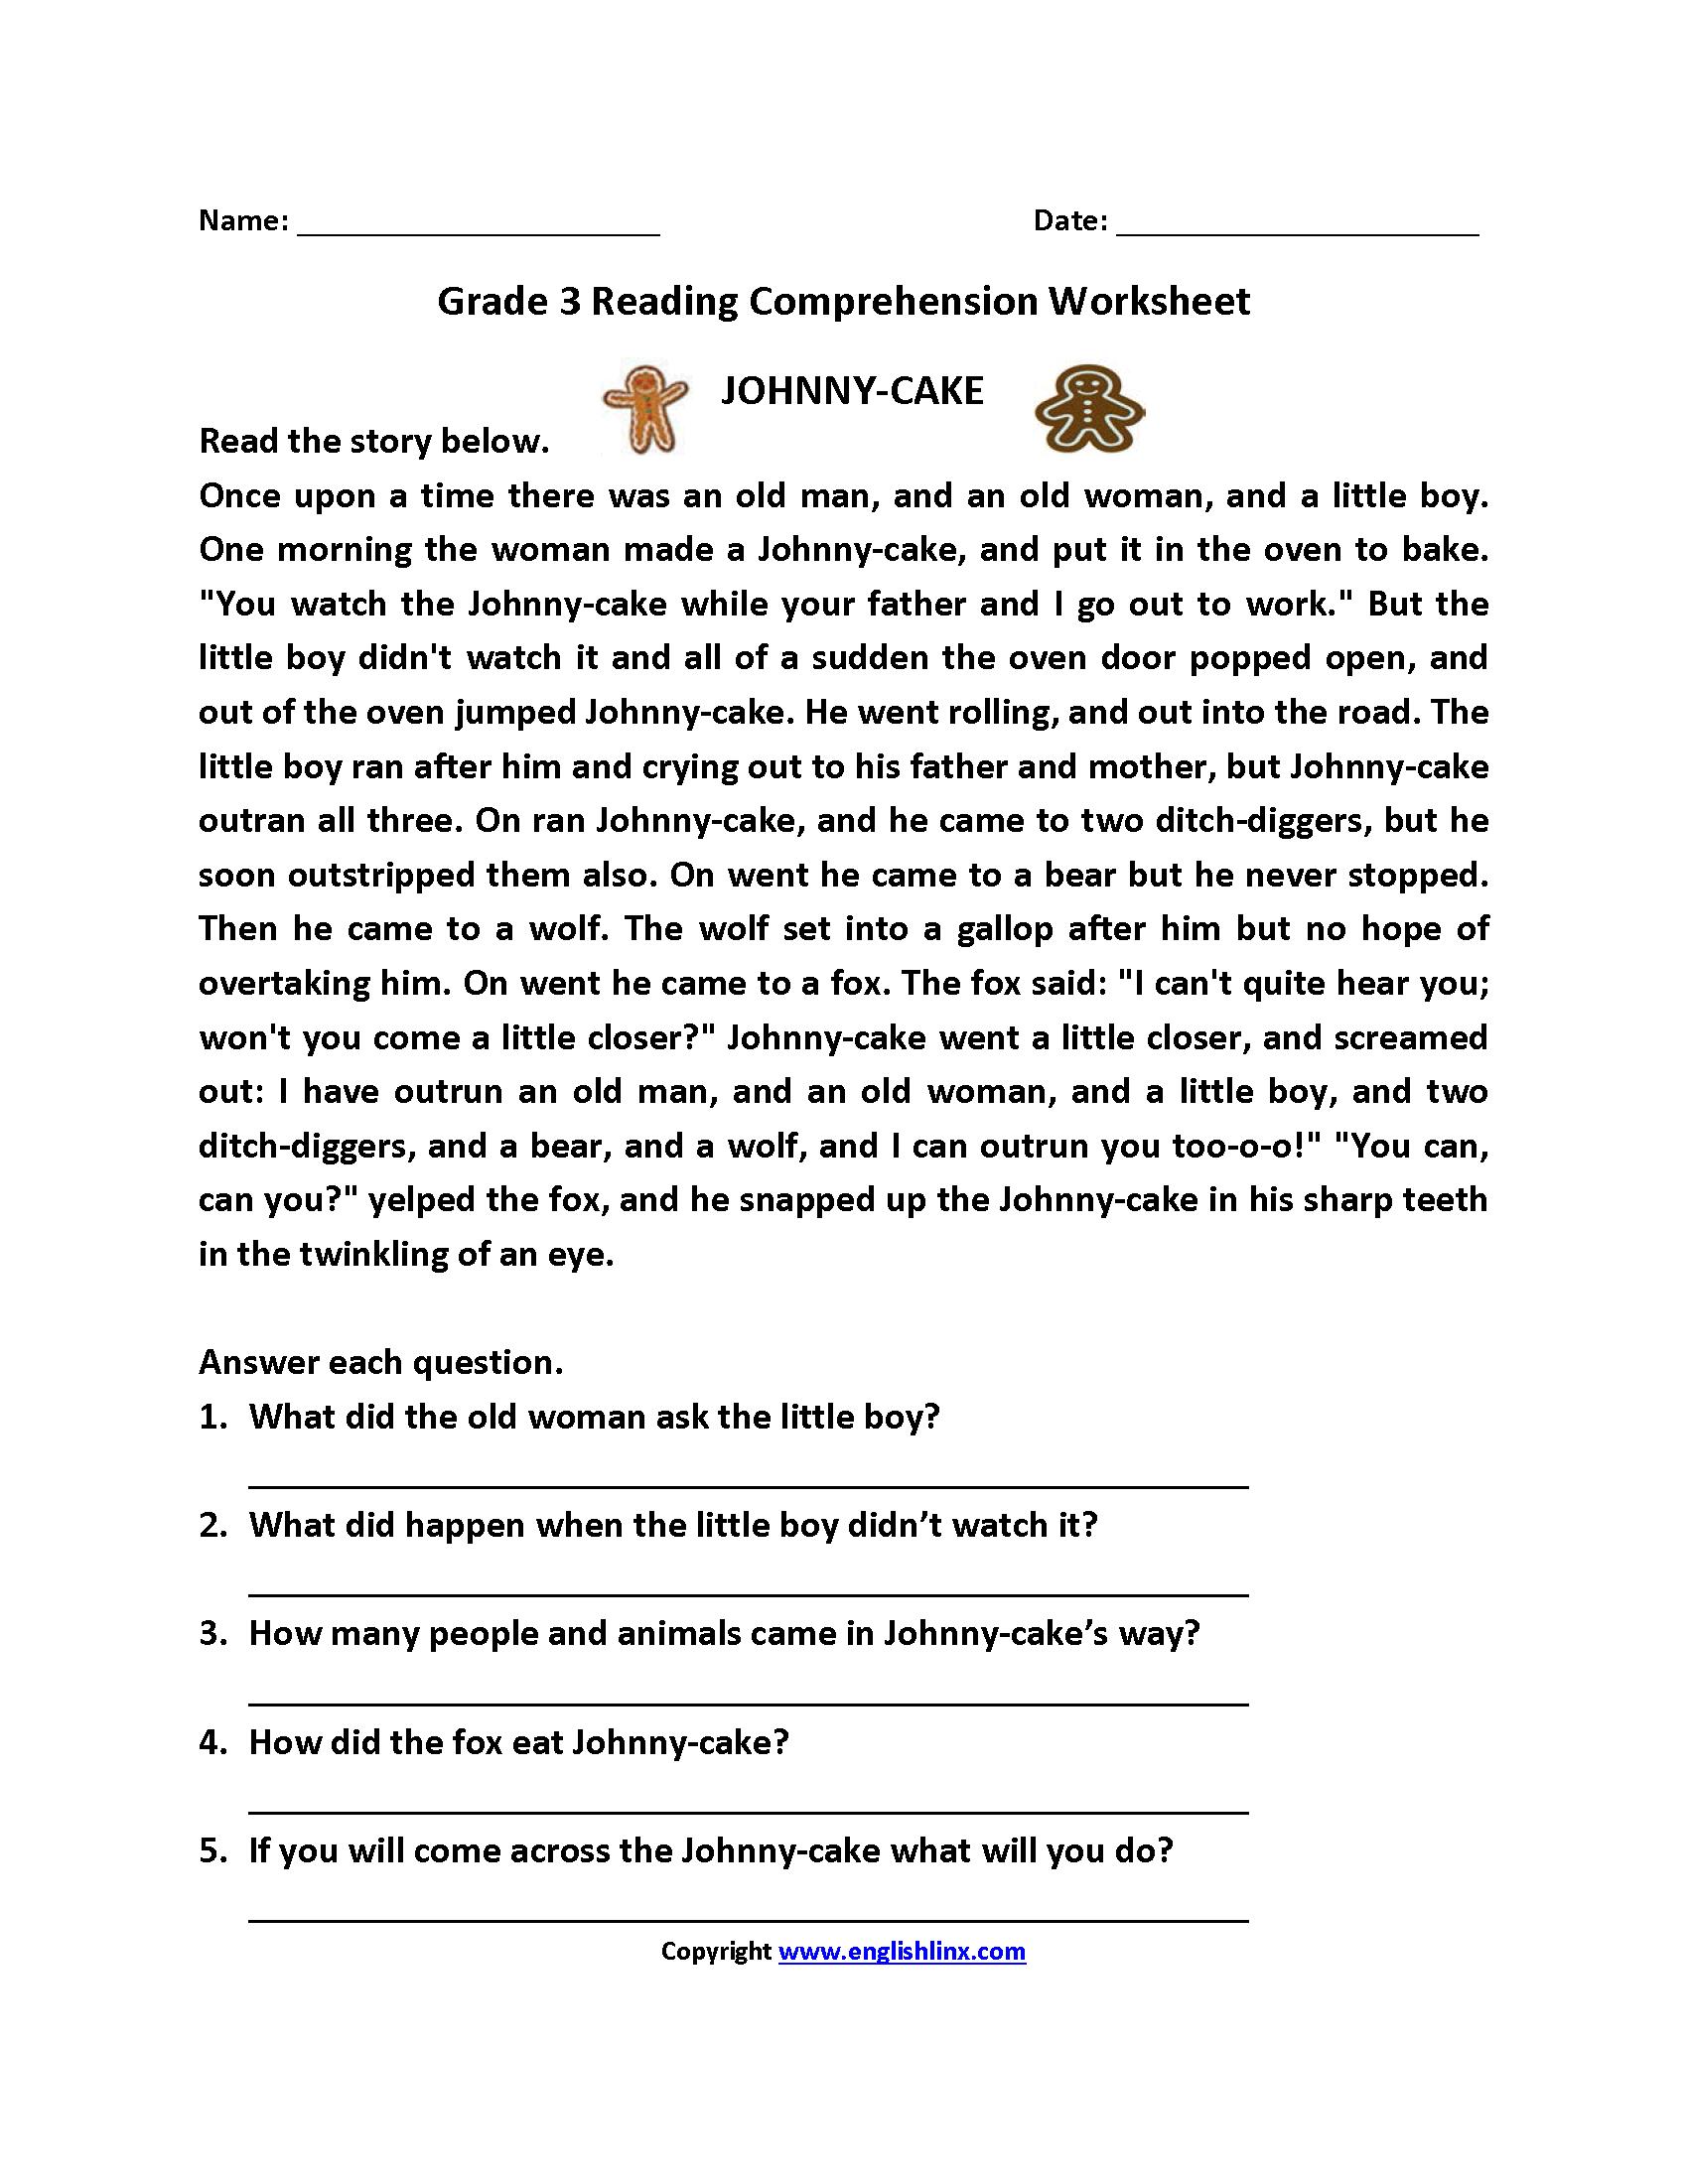 Reading Worksheets  Third Grade Reading Worksheets For Comprehension Worksheets For Grade 3